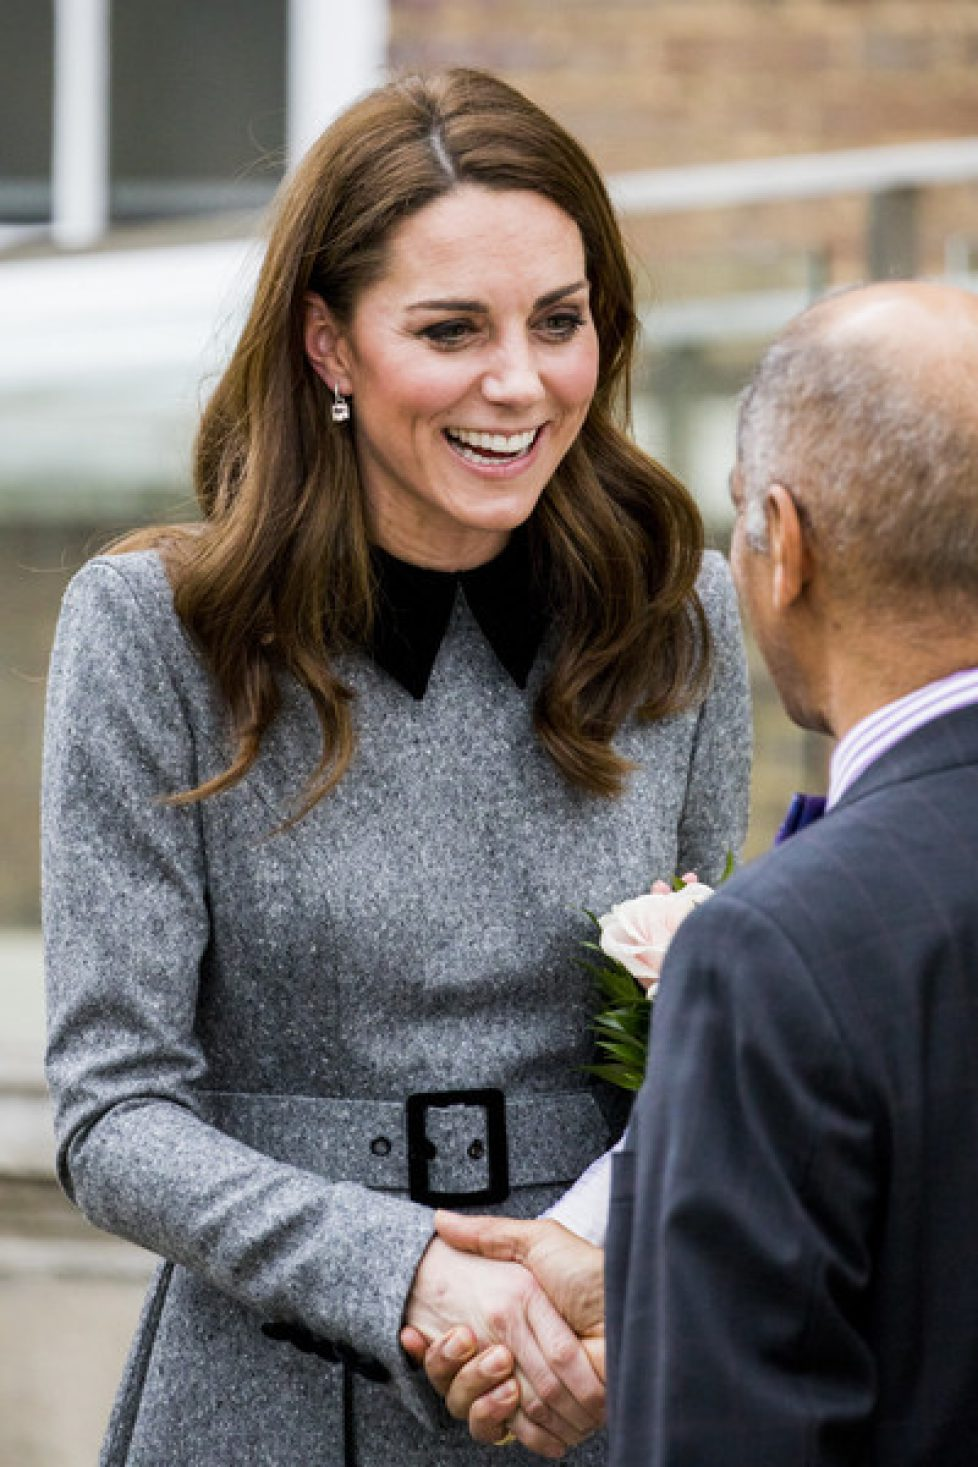 Duchess+Cambridge+Visits+Foundling+Museum+L2REQLajCEil